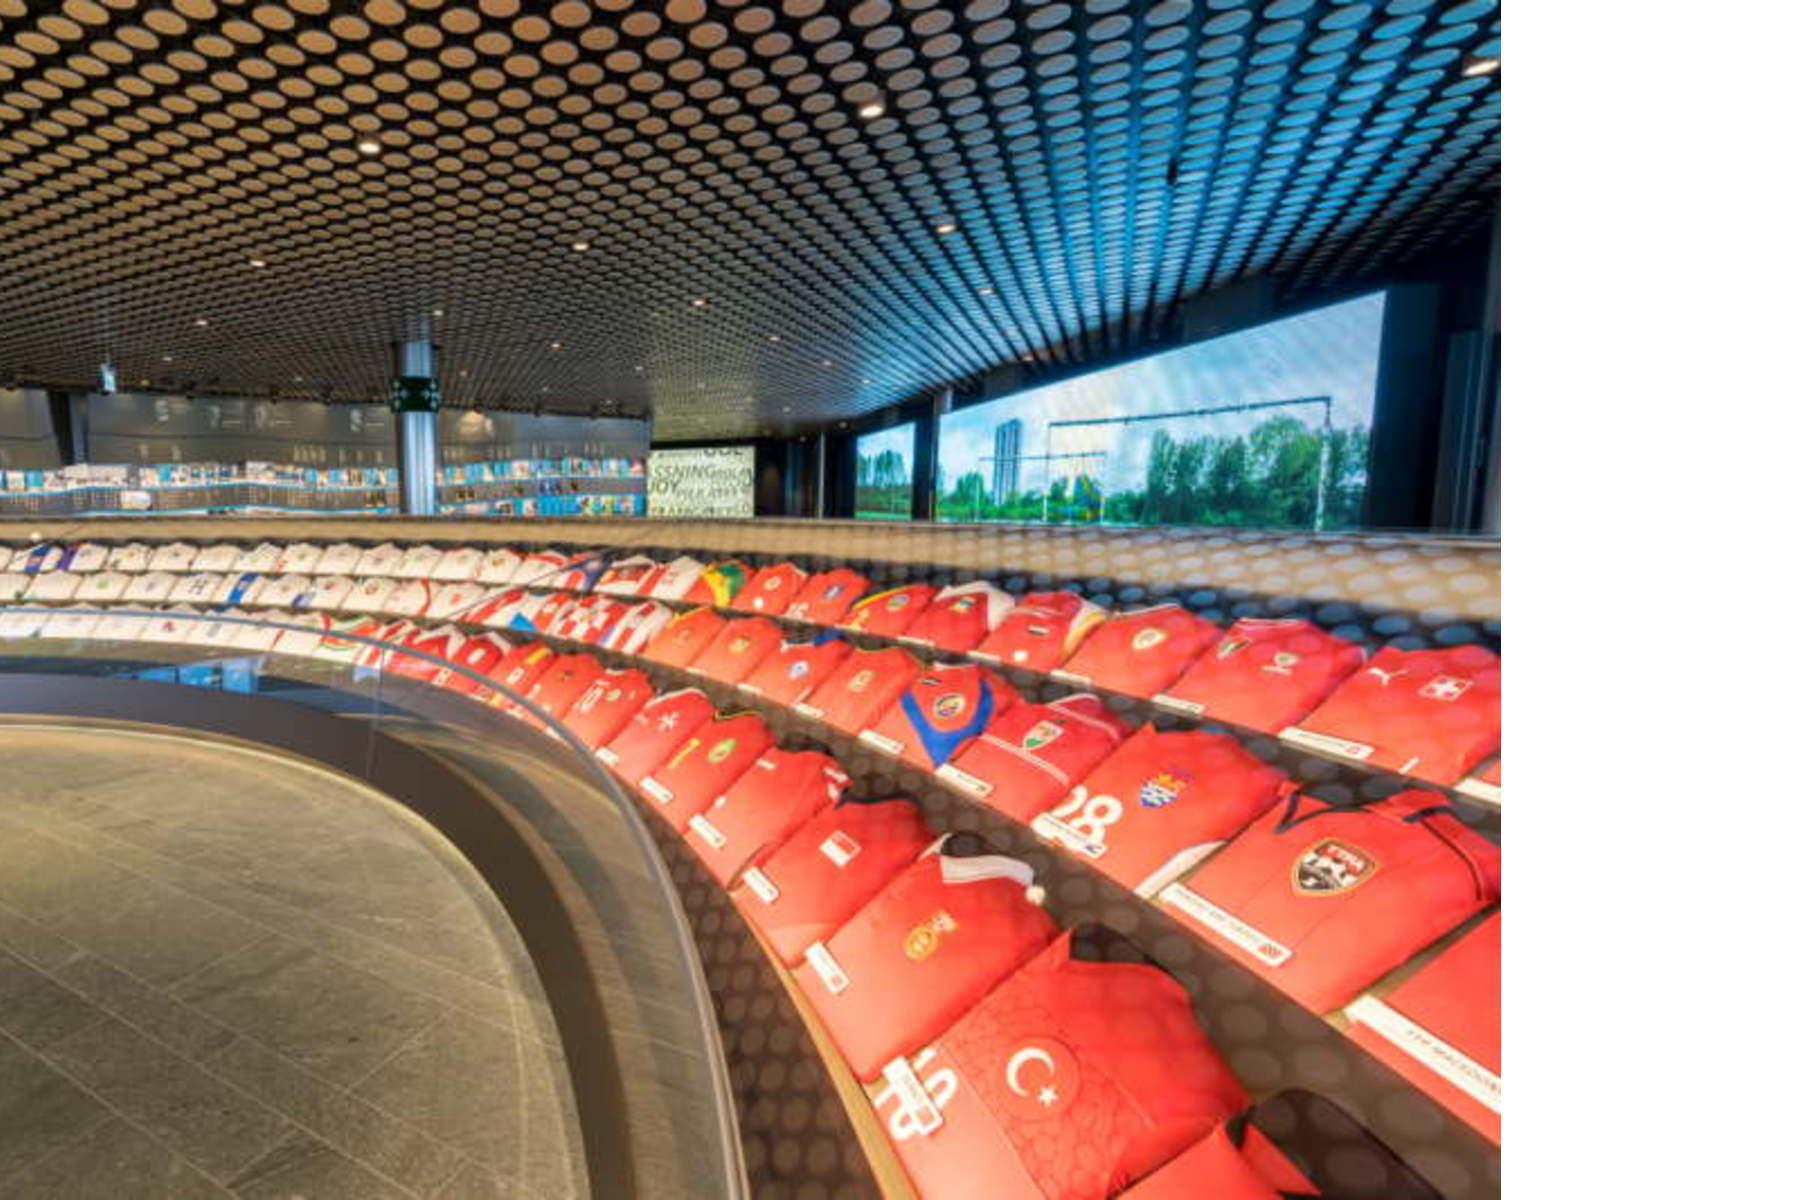 Lake Zurich Football >> FIFA Football World Museum opens in Zurich | Floornature